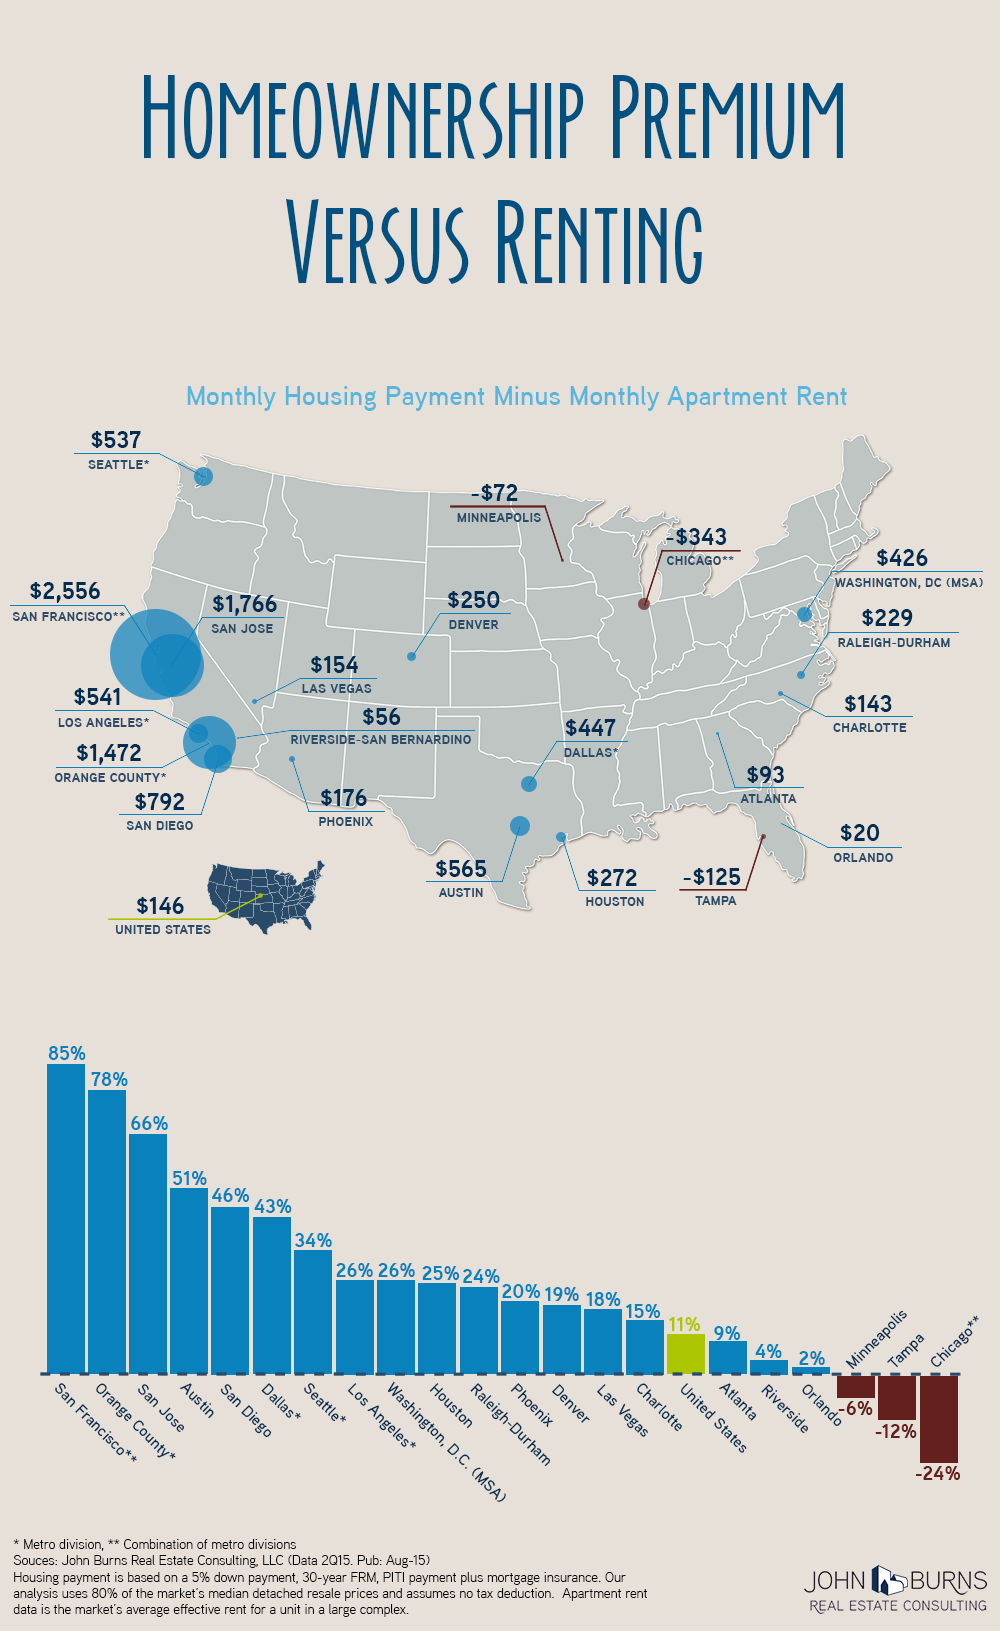 Homeownership vs Renting